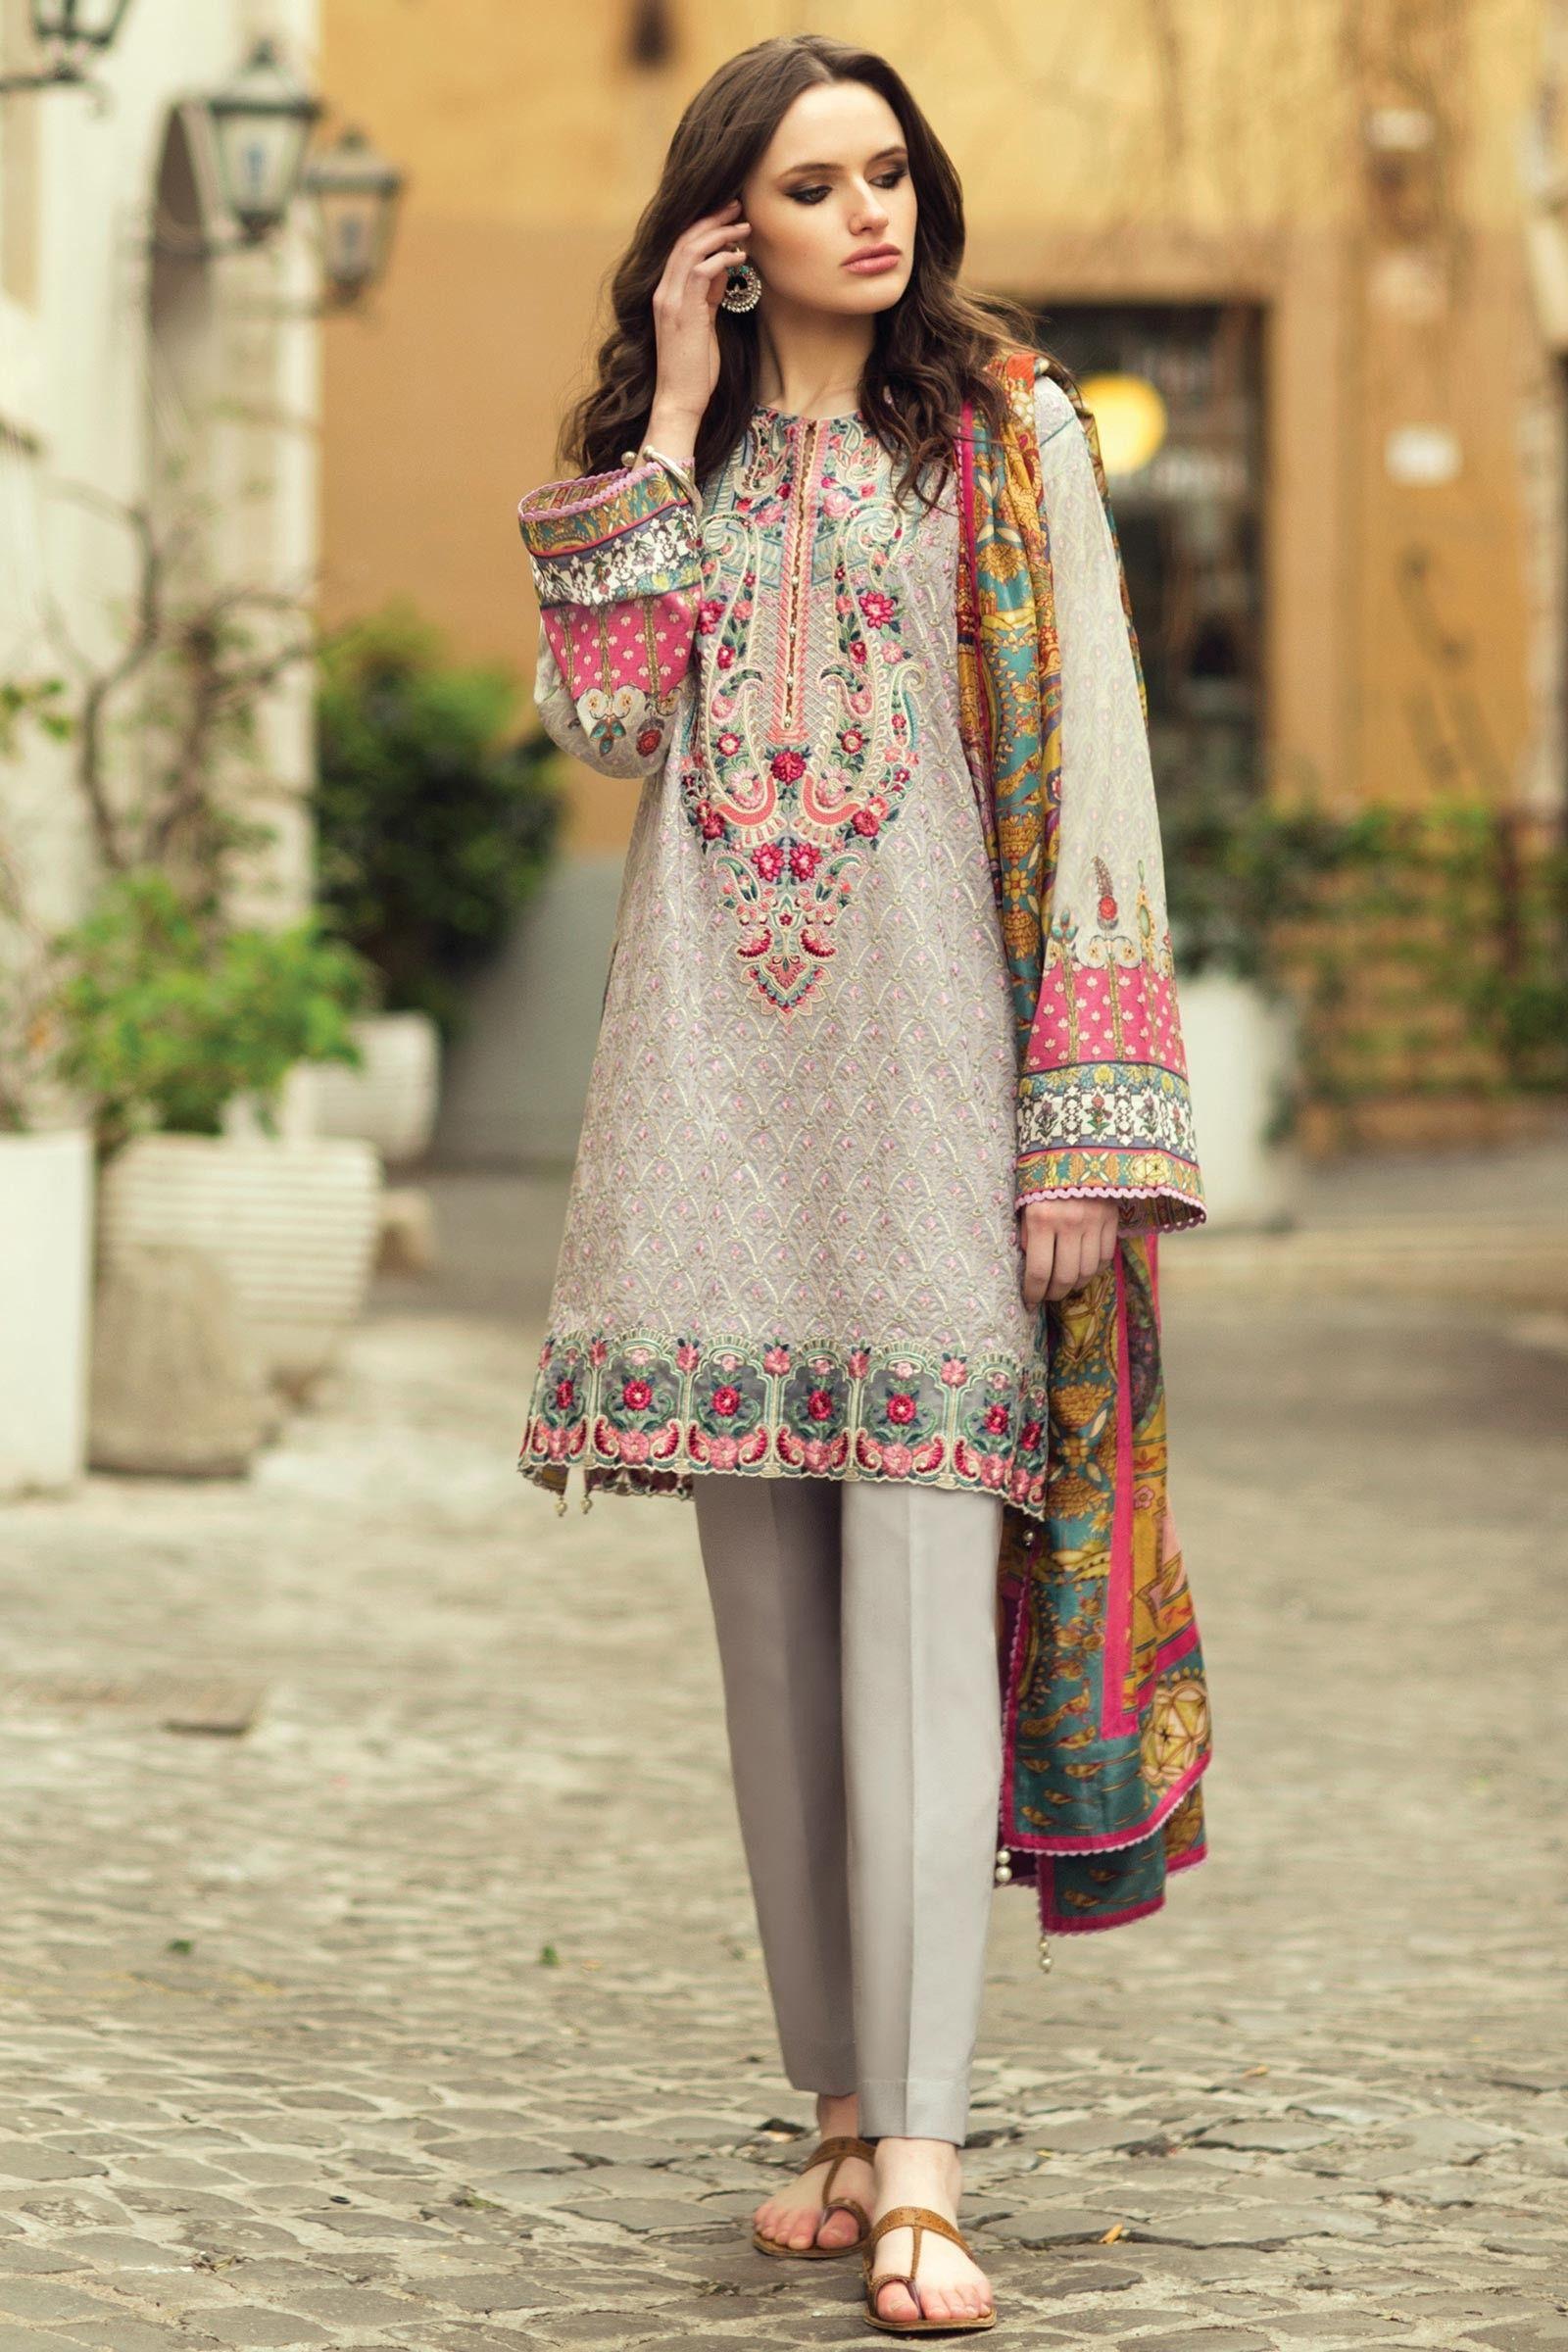 Elegant sand color 3 piece unstitched pret dress by Zara